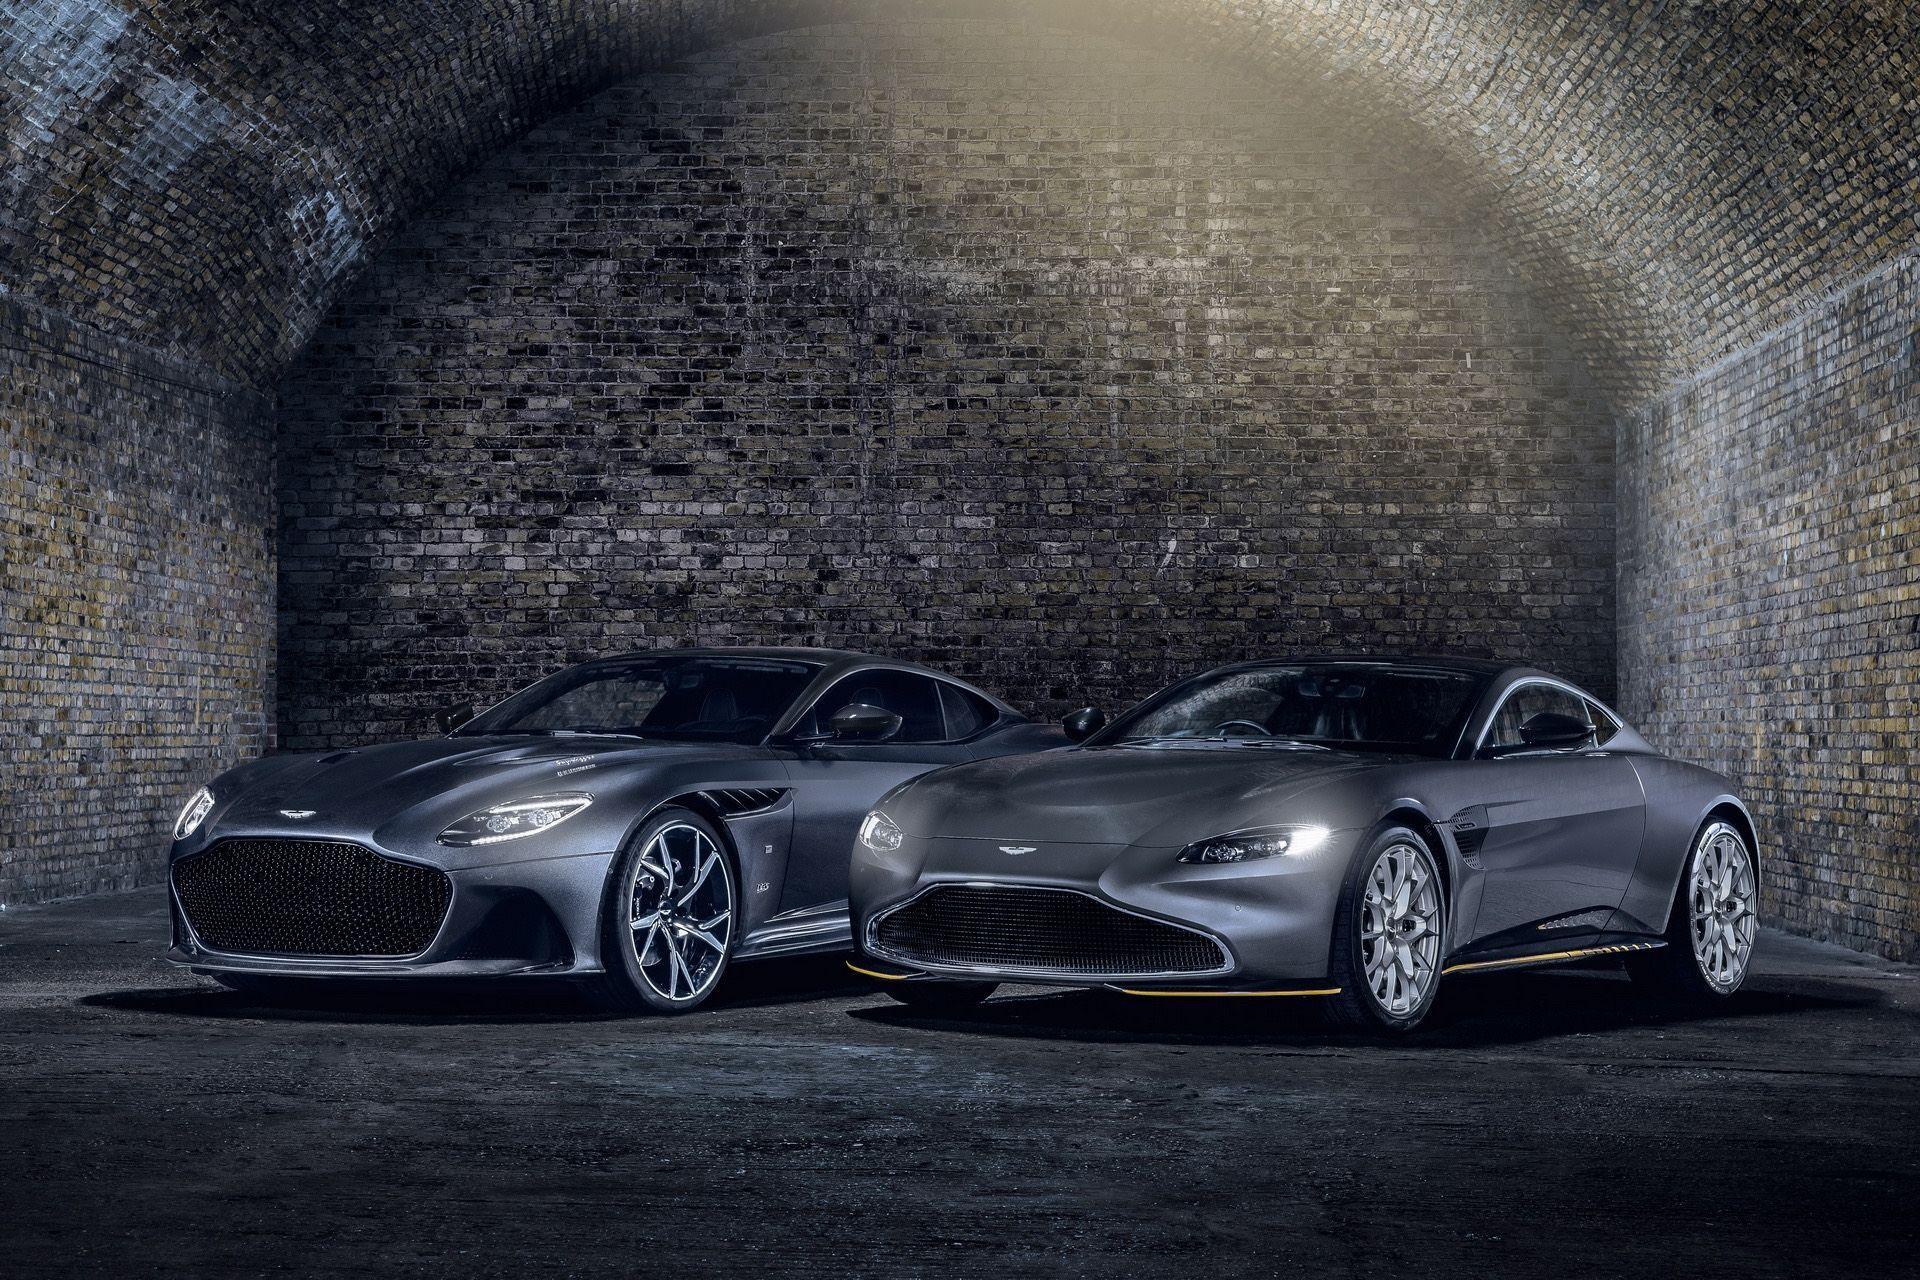 2021-aston-martin-vantage-dbs-superleggera-007-edition-1